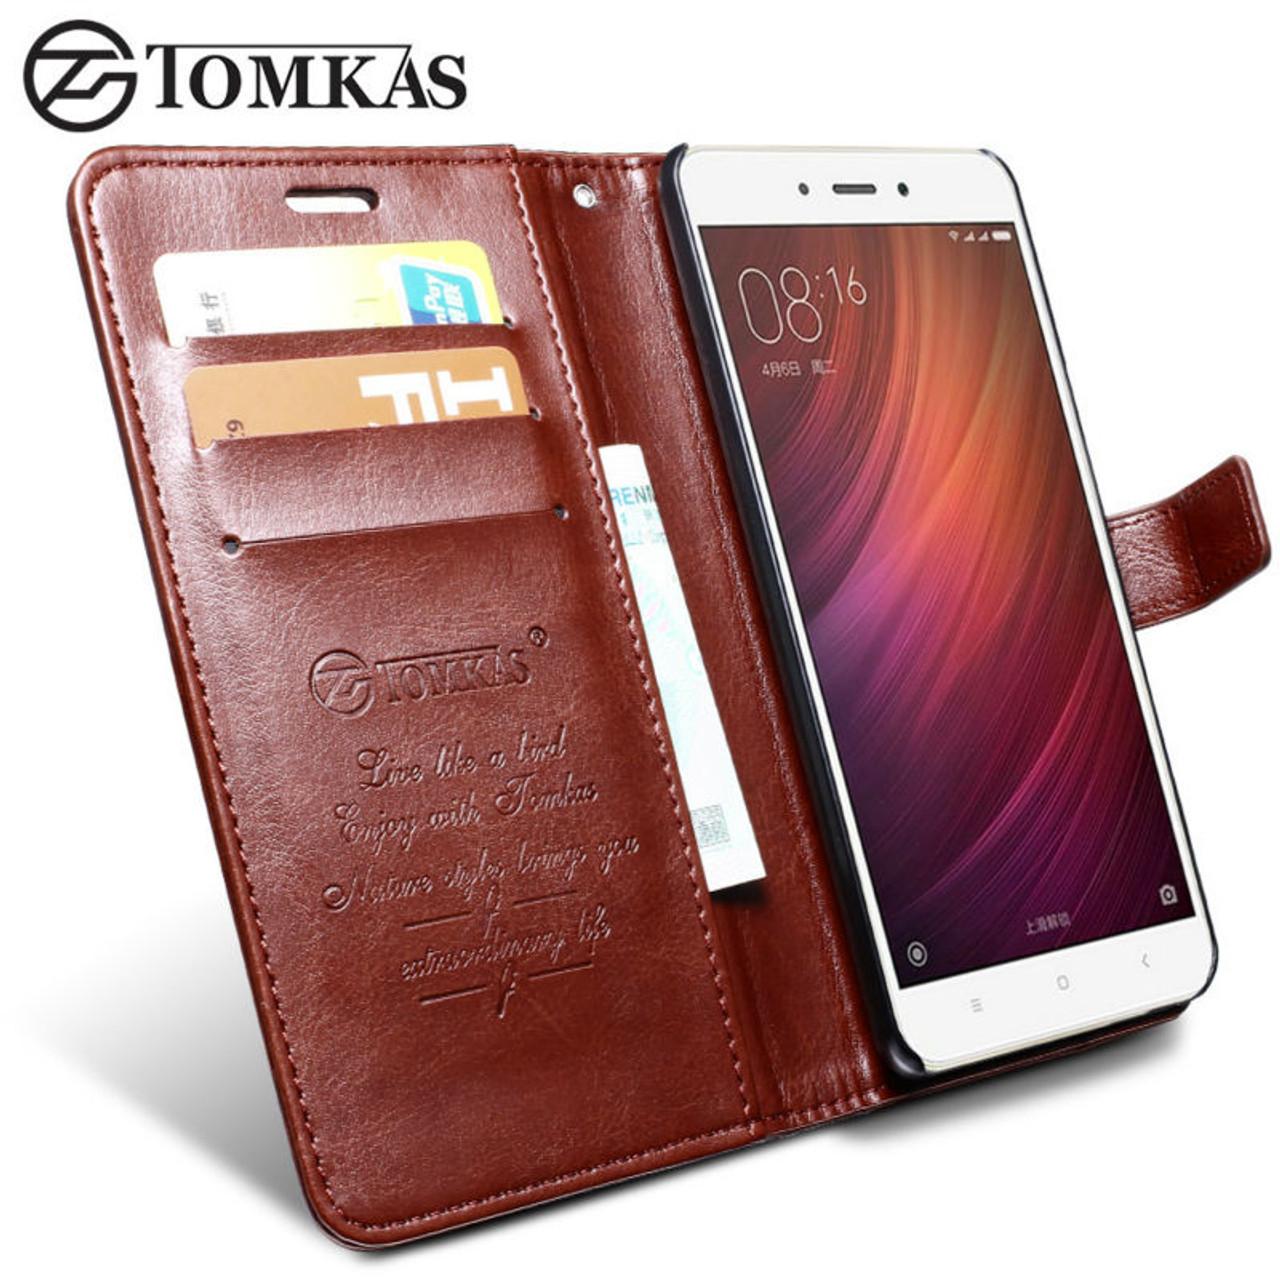 vasta selezione di 34a1a a3ae0 Xiaomi Redmi Note 4 Case Cover TOMKAS Original Leather Phone Bag Cover Flip  Wallet Coque Case For Xiaomi Redmi Note 4 Prime